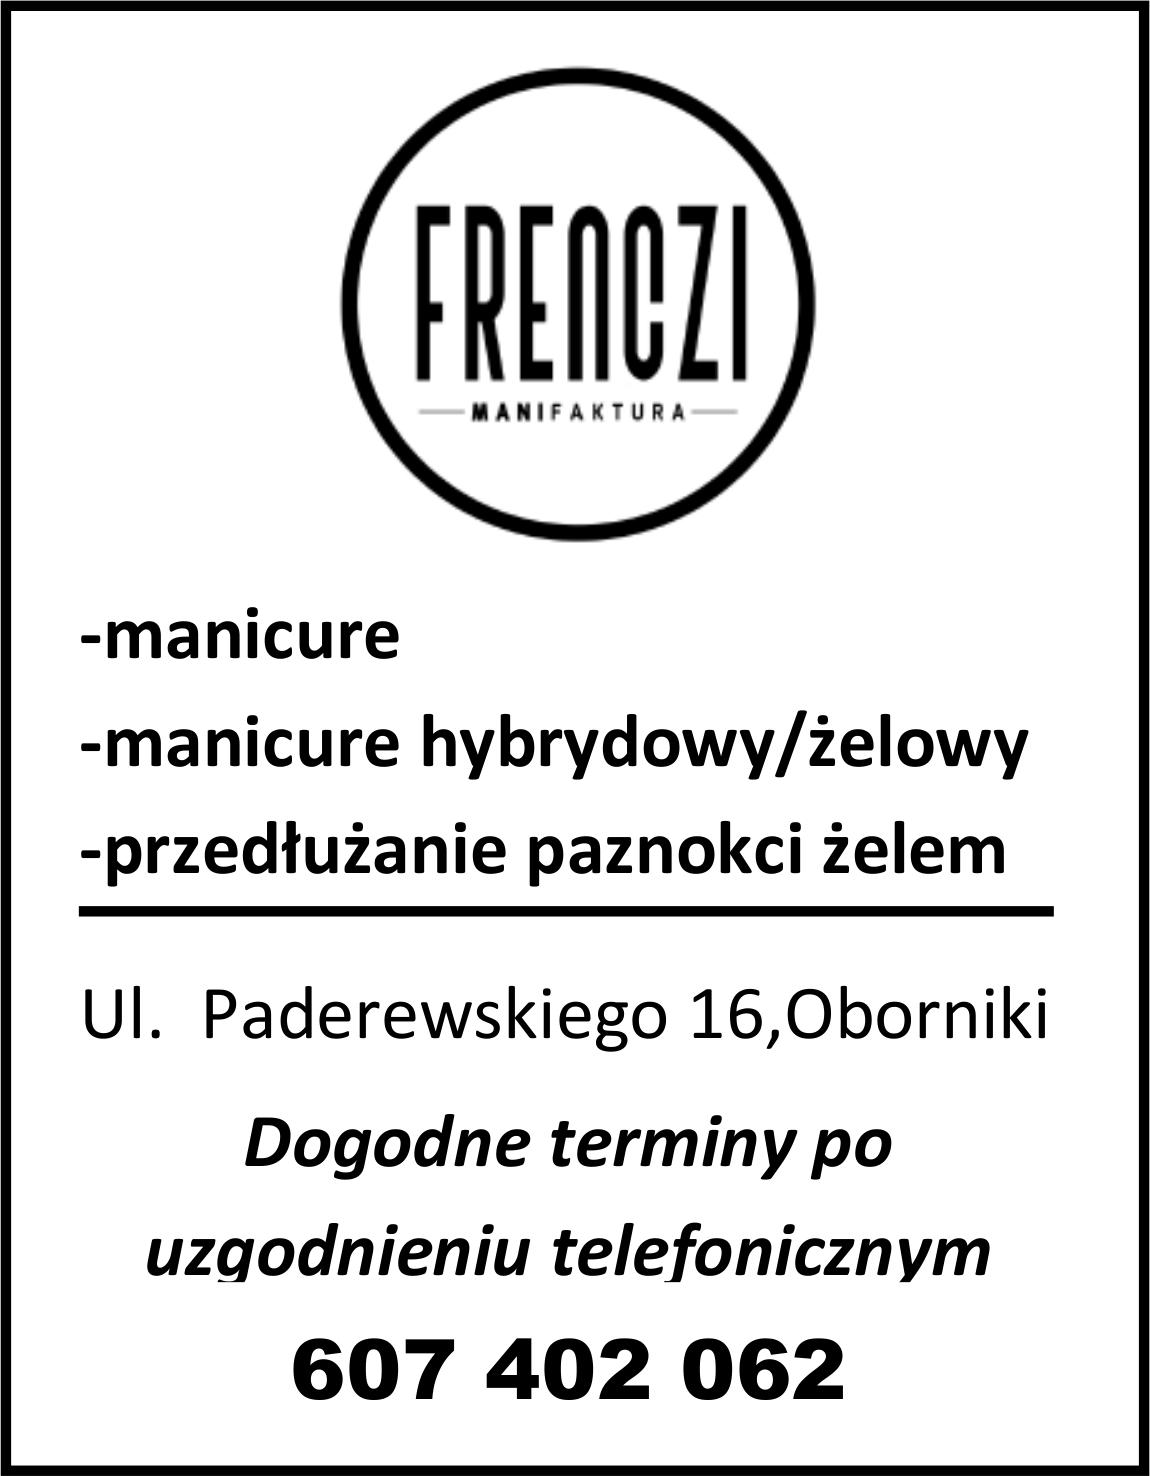 Manicure Oborniki